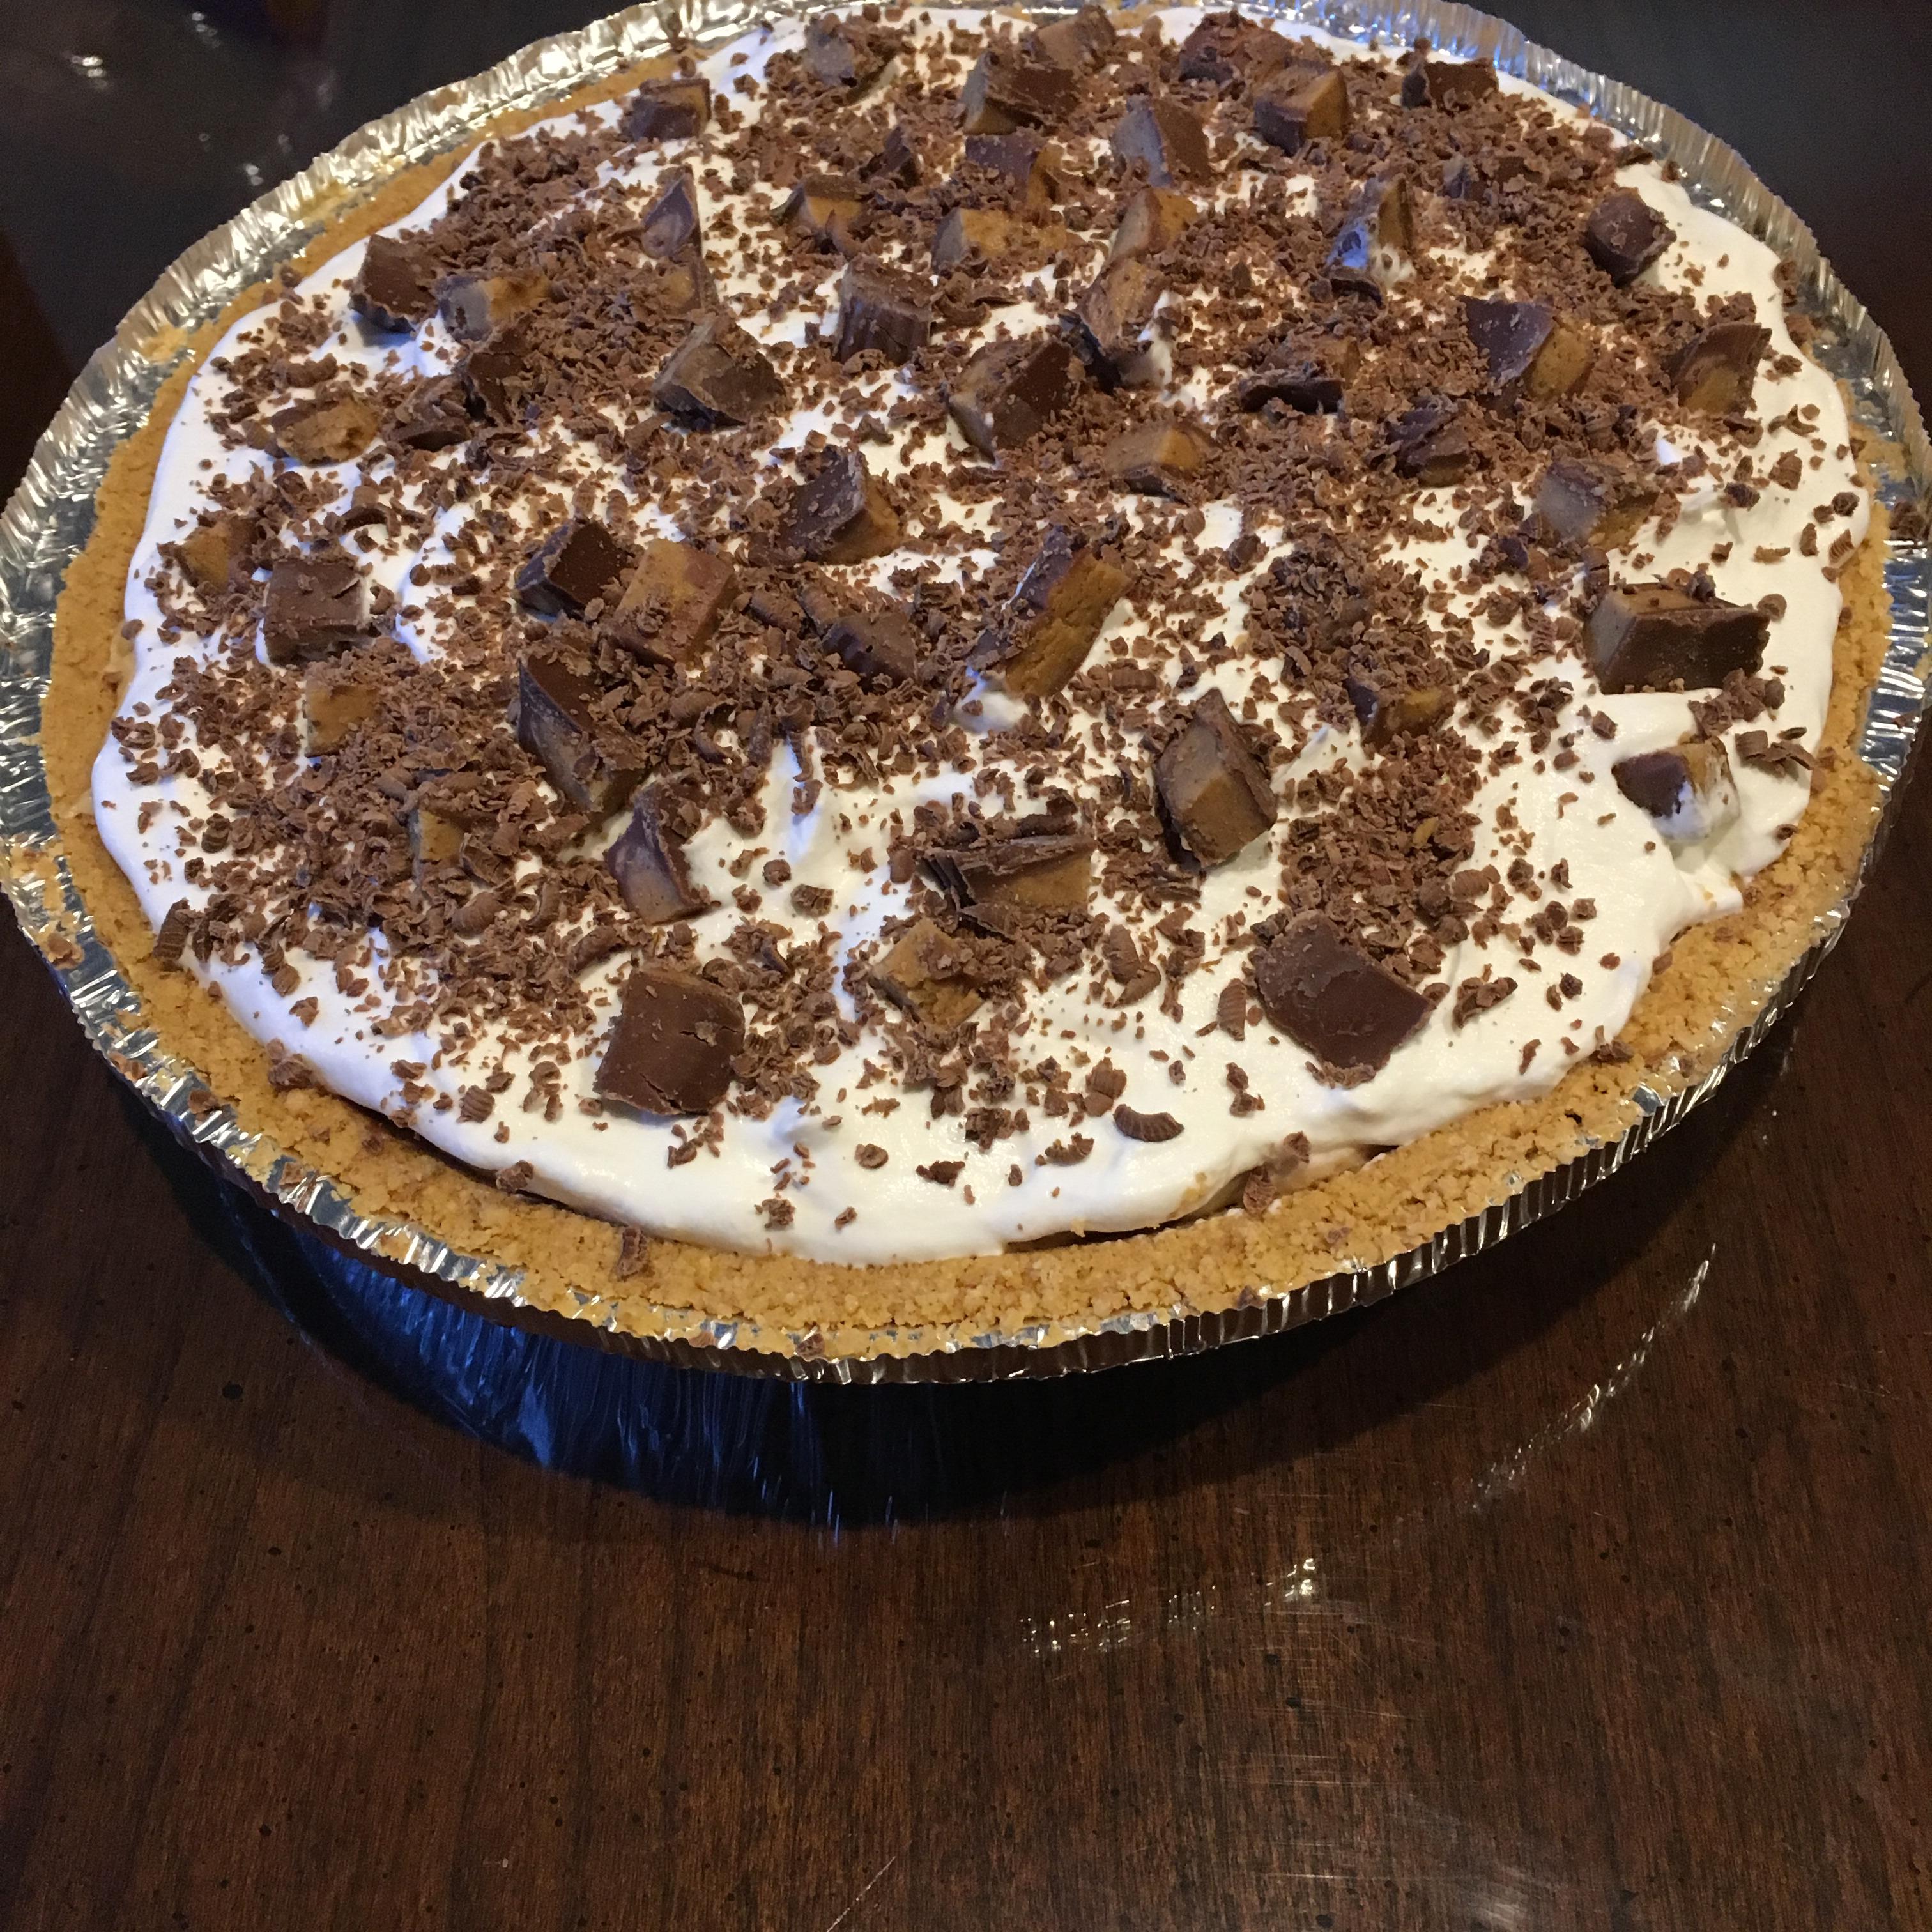 No-Bake Peanut Butter/Chocolate Pie cajen